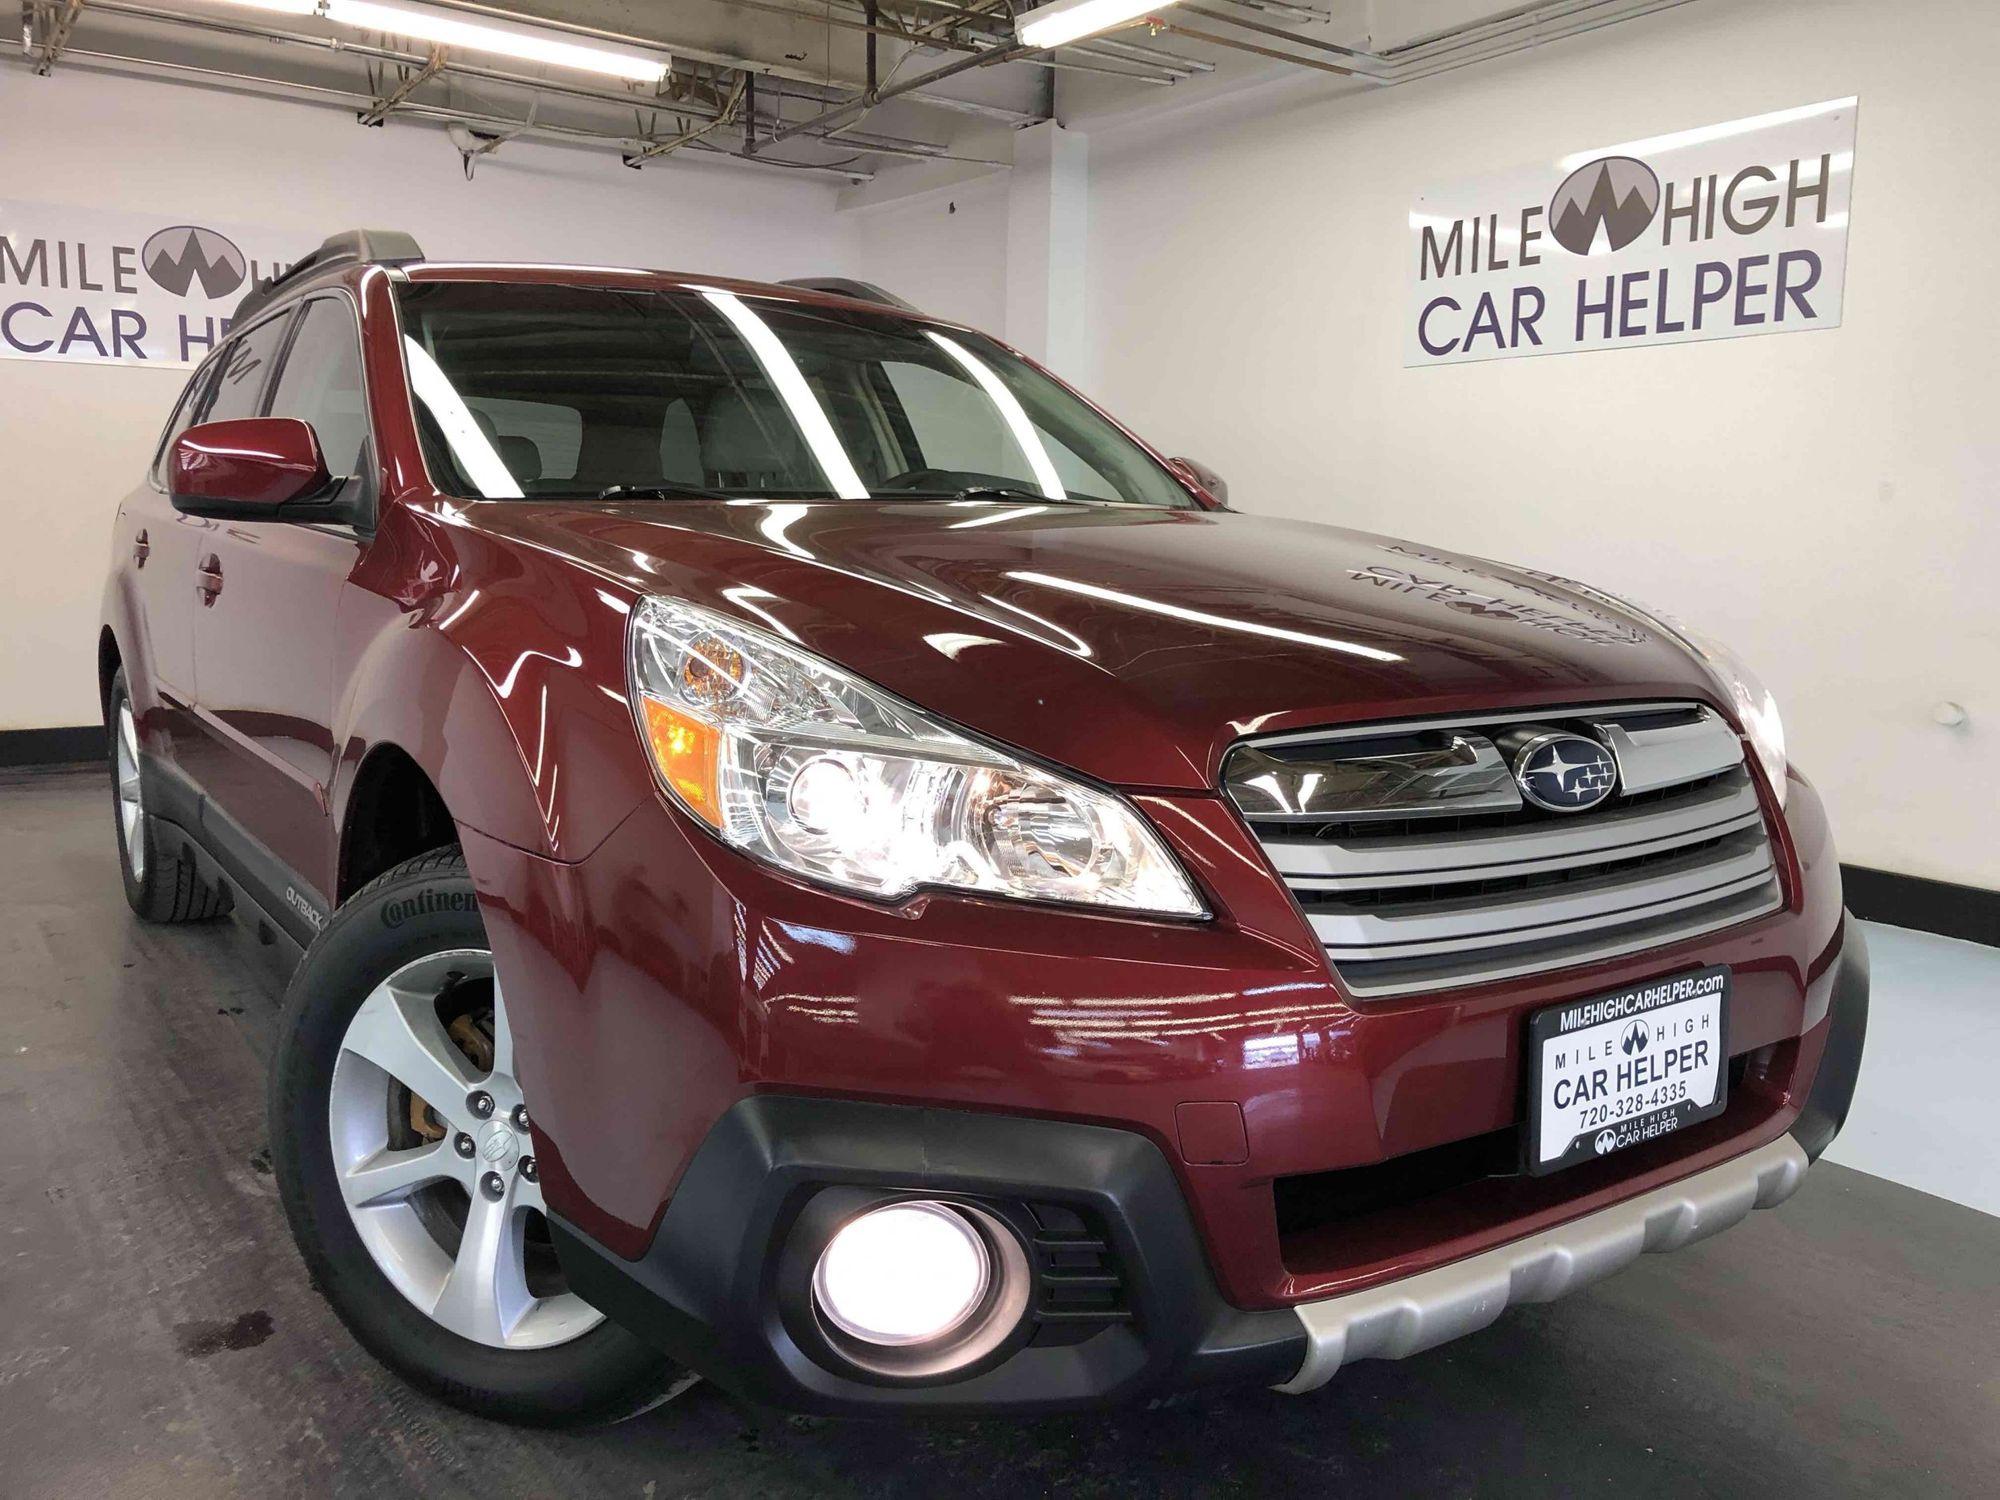 2014 Subaru Outback 2 5i Limited | Mile High Car Helper